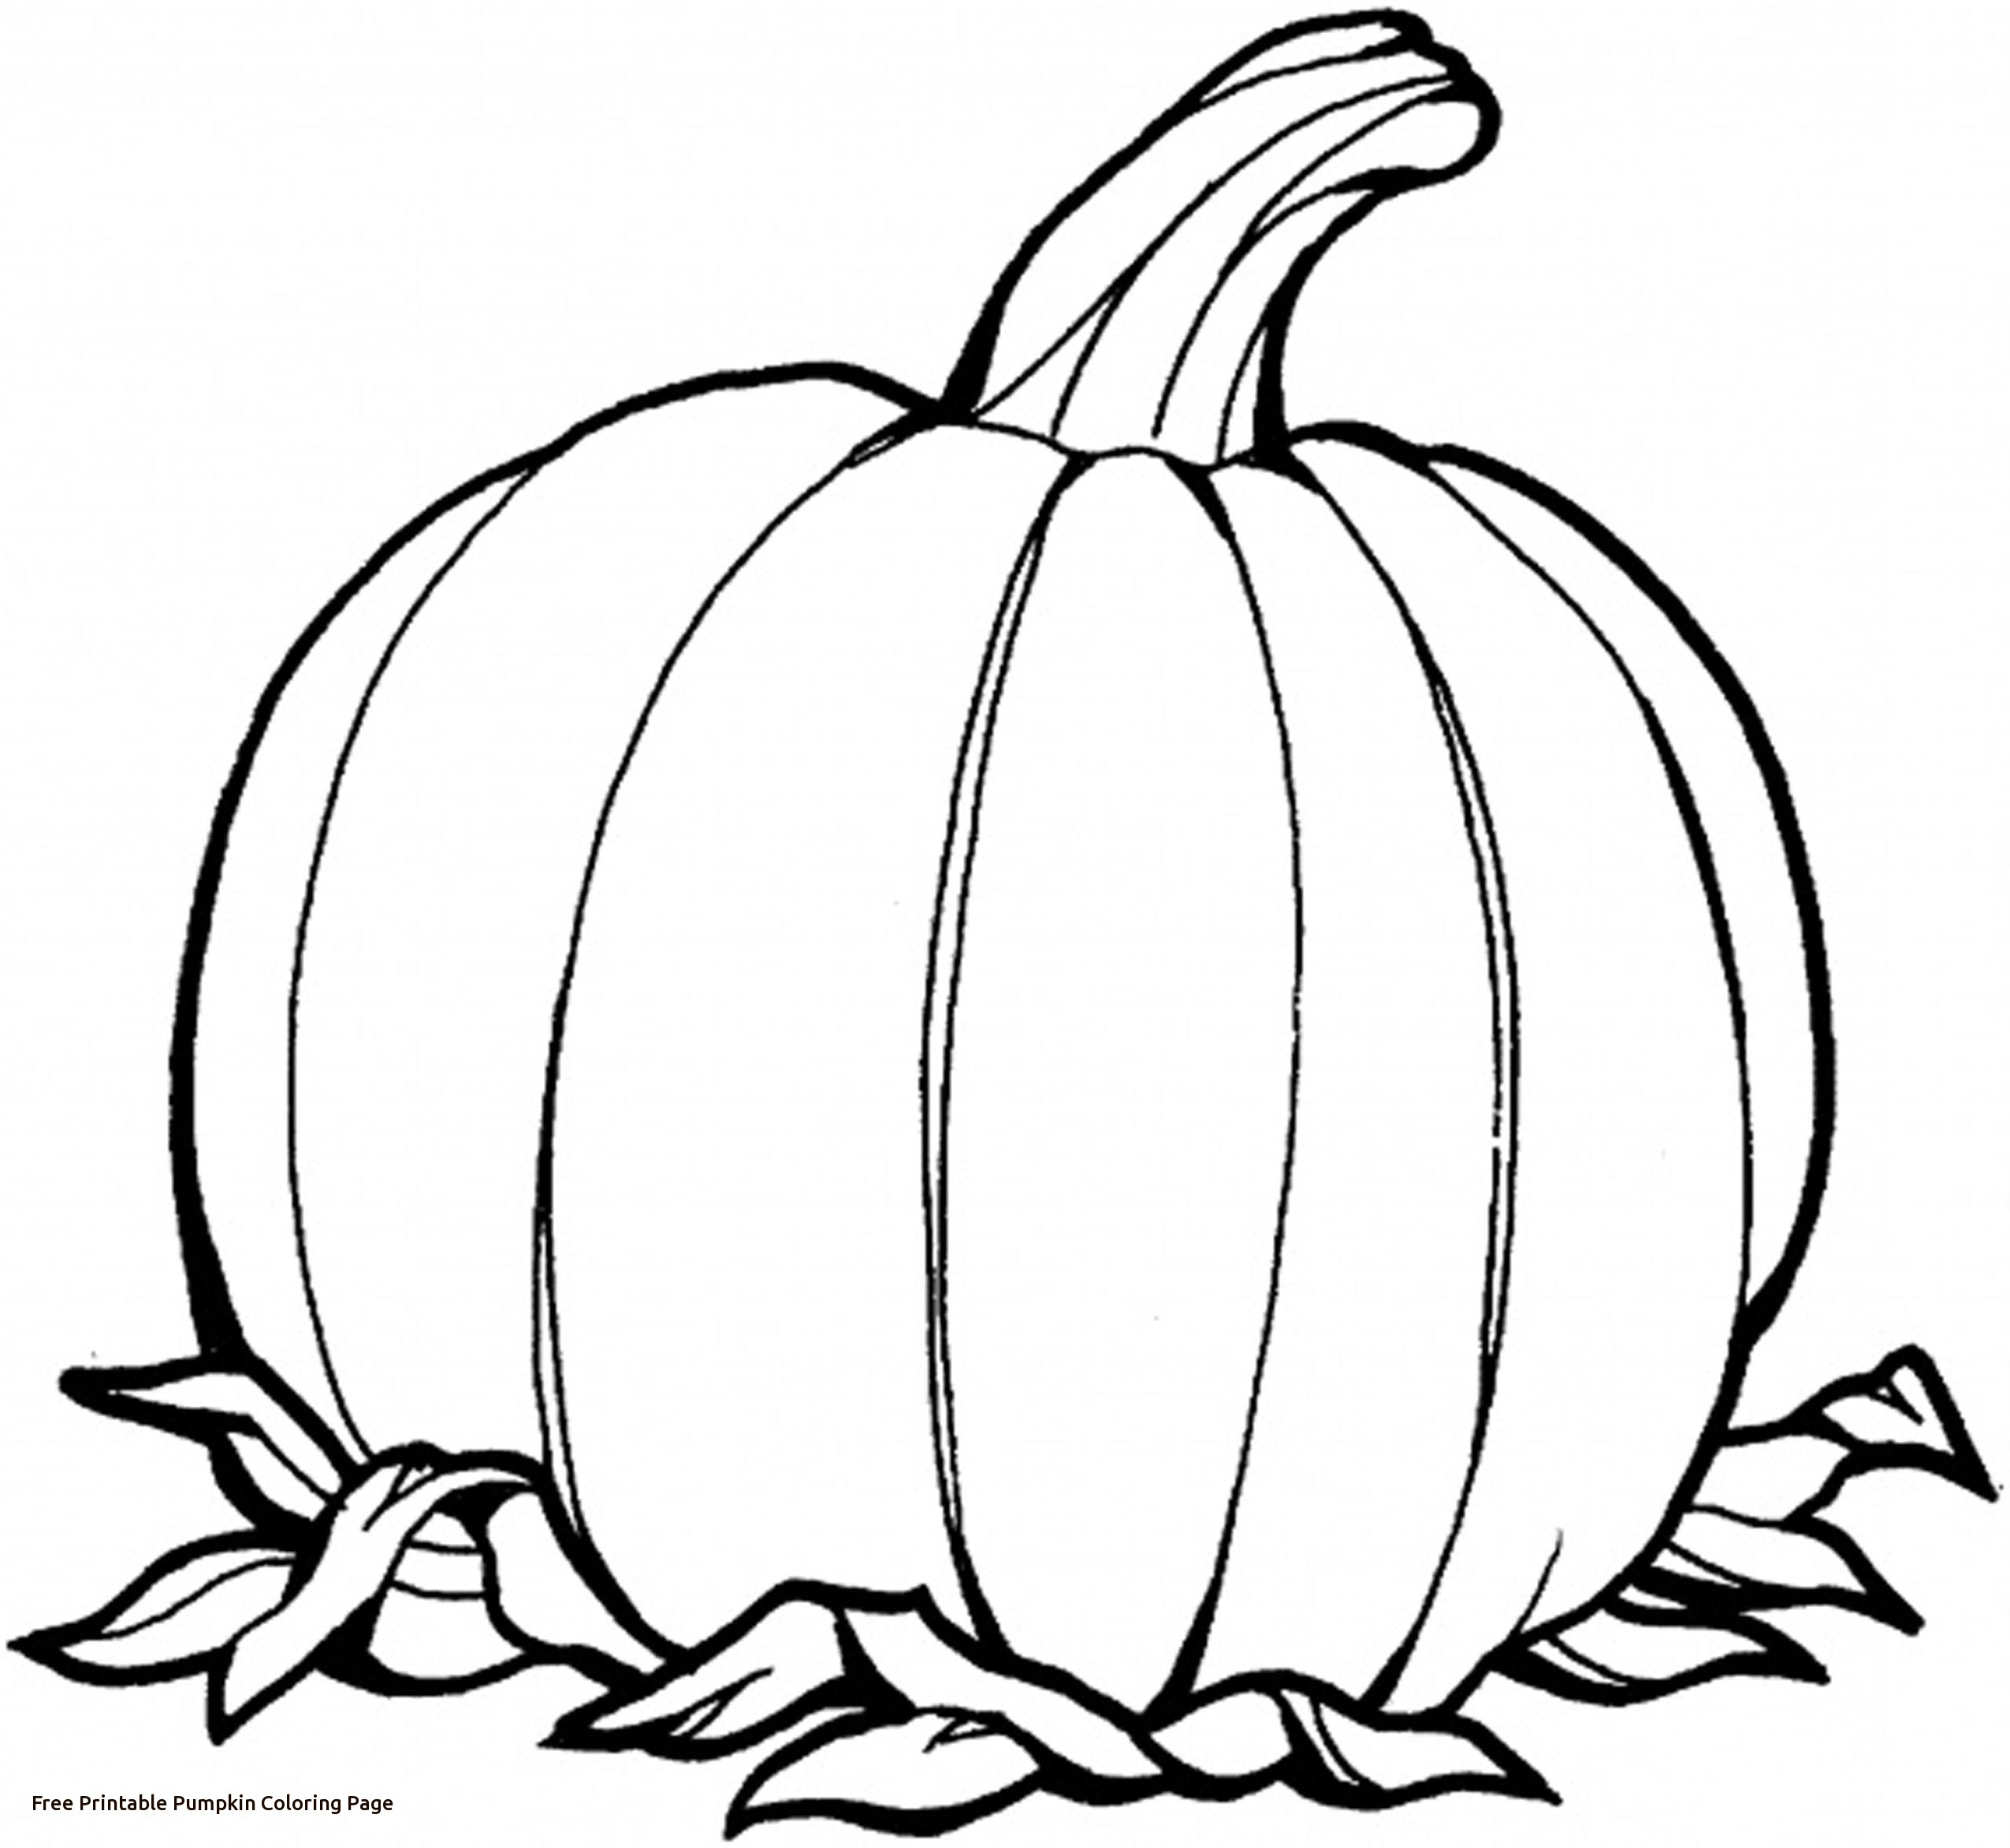 Pumpkin outline printable free download best pumpkin for Blank pumpkin coloring page